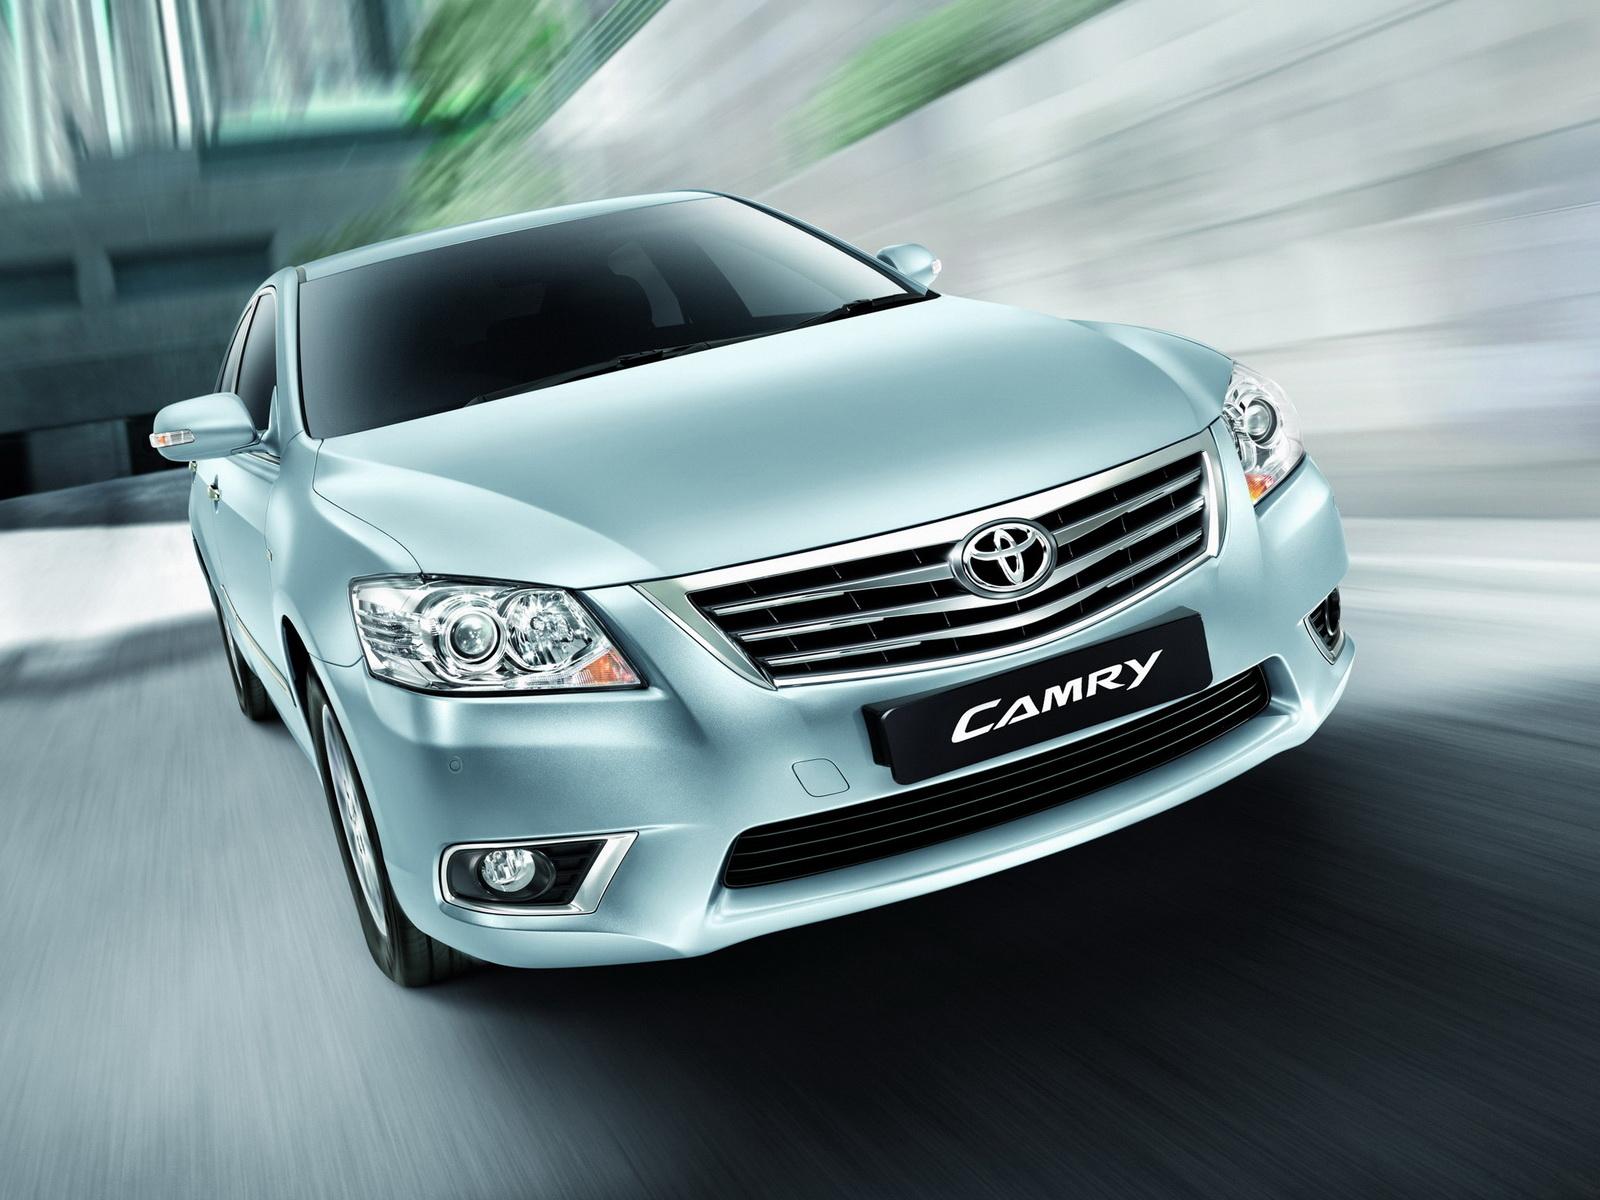 Toyota Camry Wallpaper 1   1600 X 1200 stmednet 1600x1200